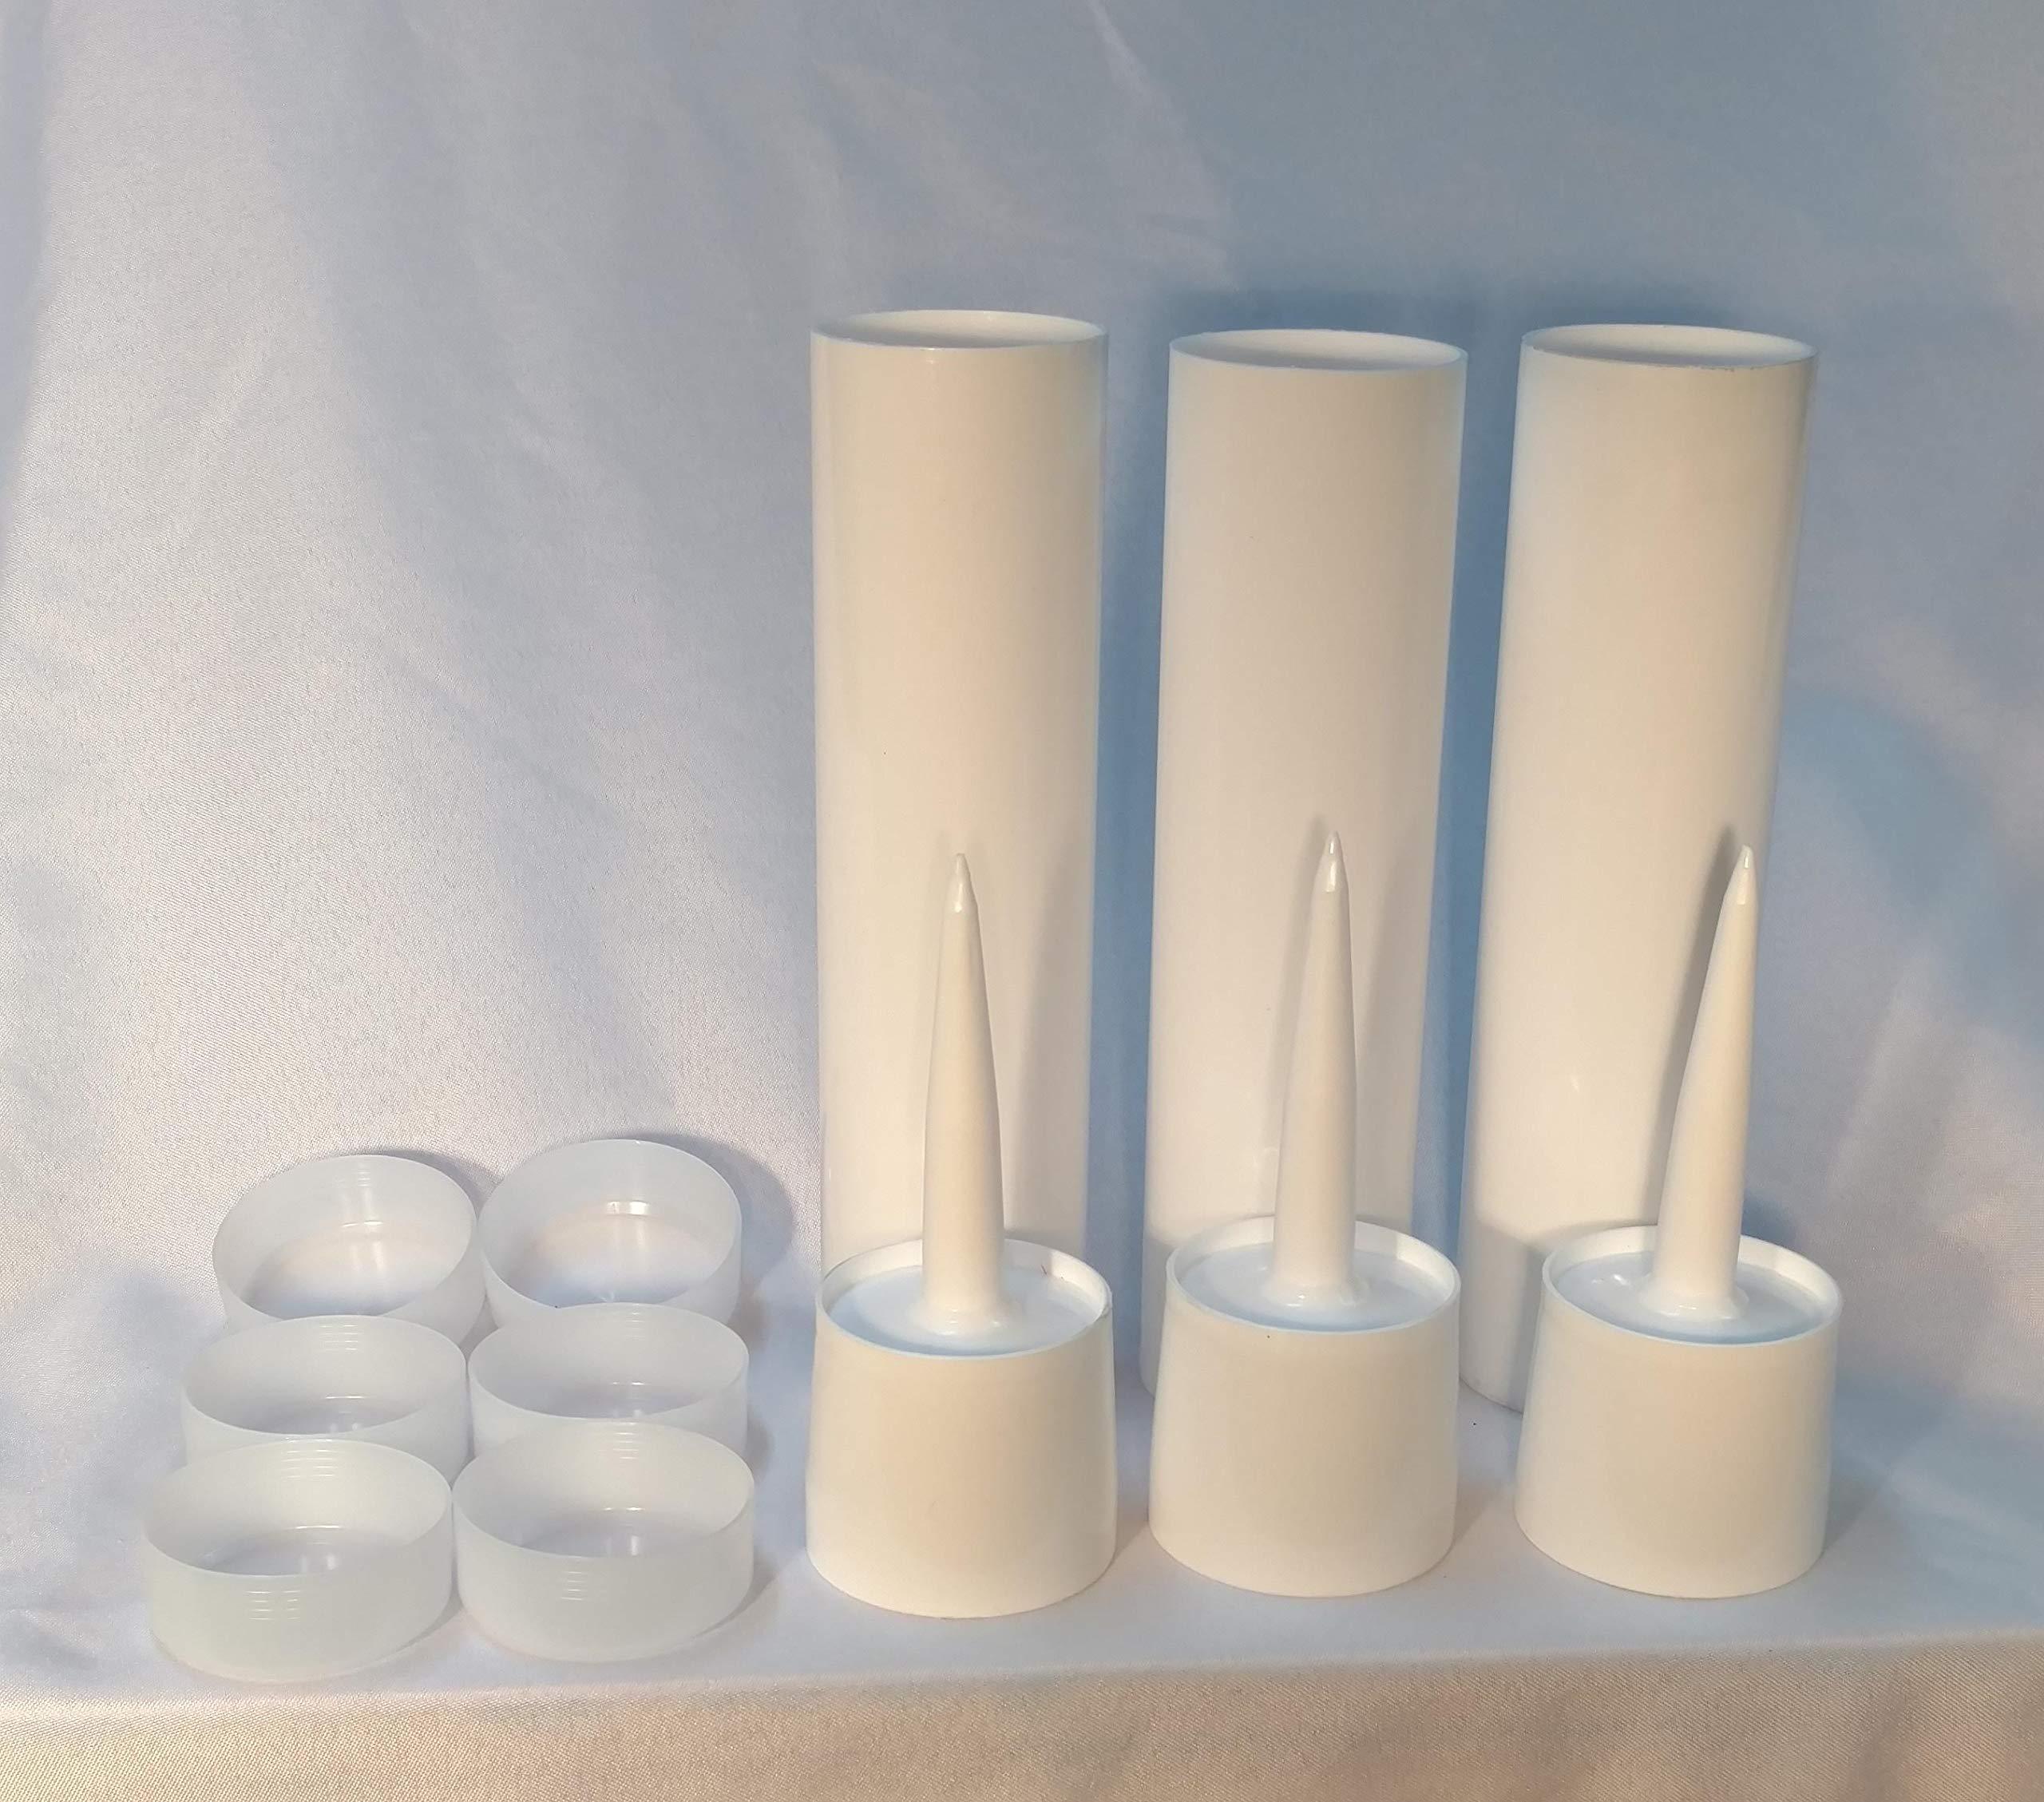 Quart Size Reusable Empty Caulk Tube - REFILLABLE CAULKING Cartridge 32 oz. - 3 Pack - Made in USA